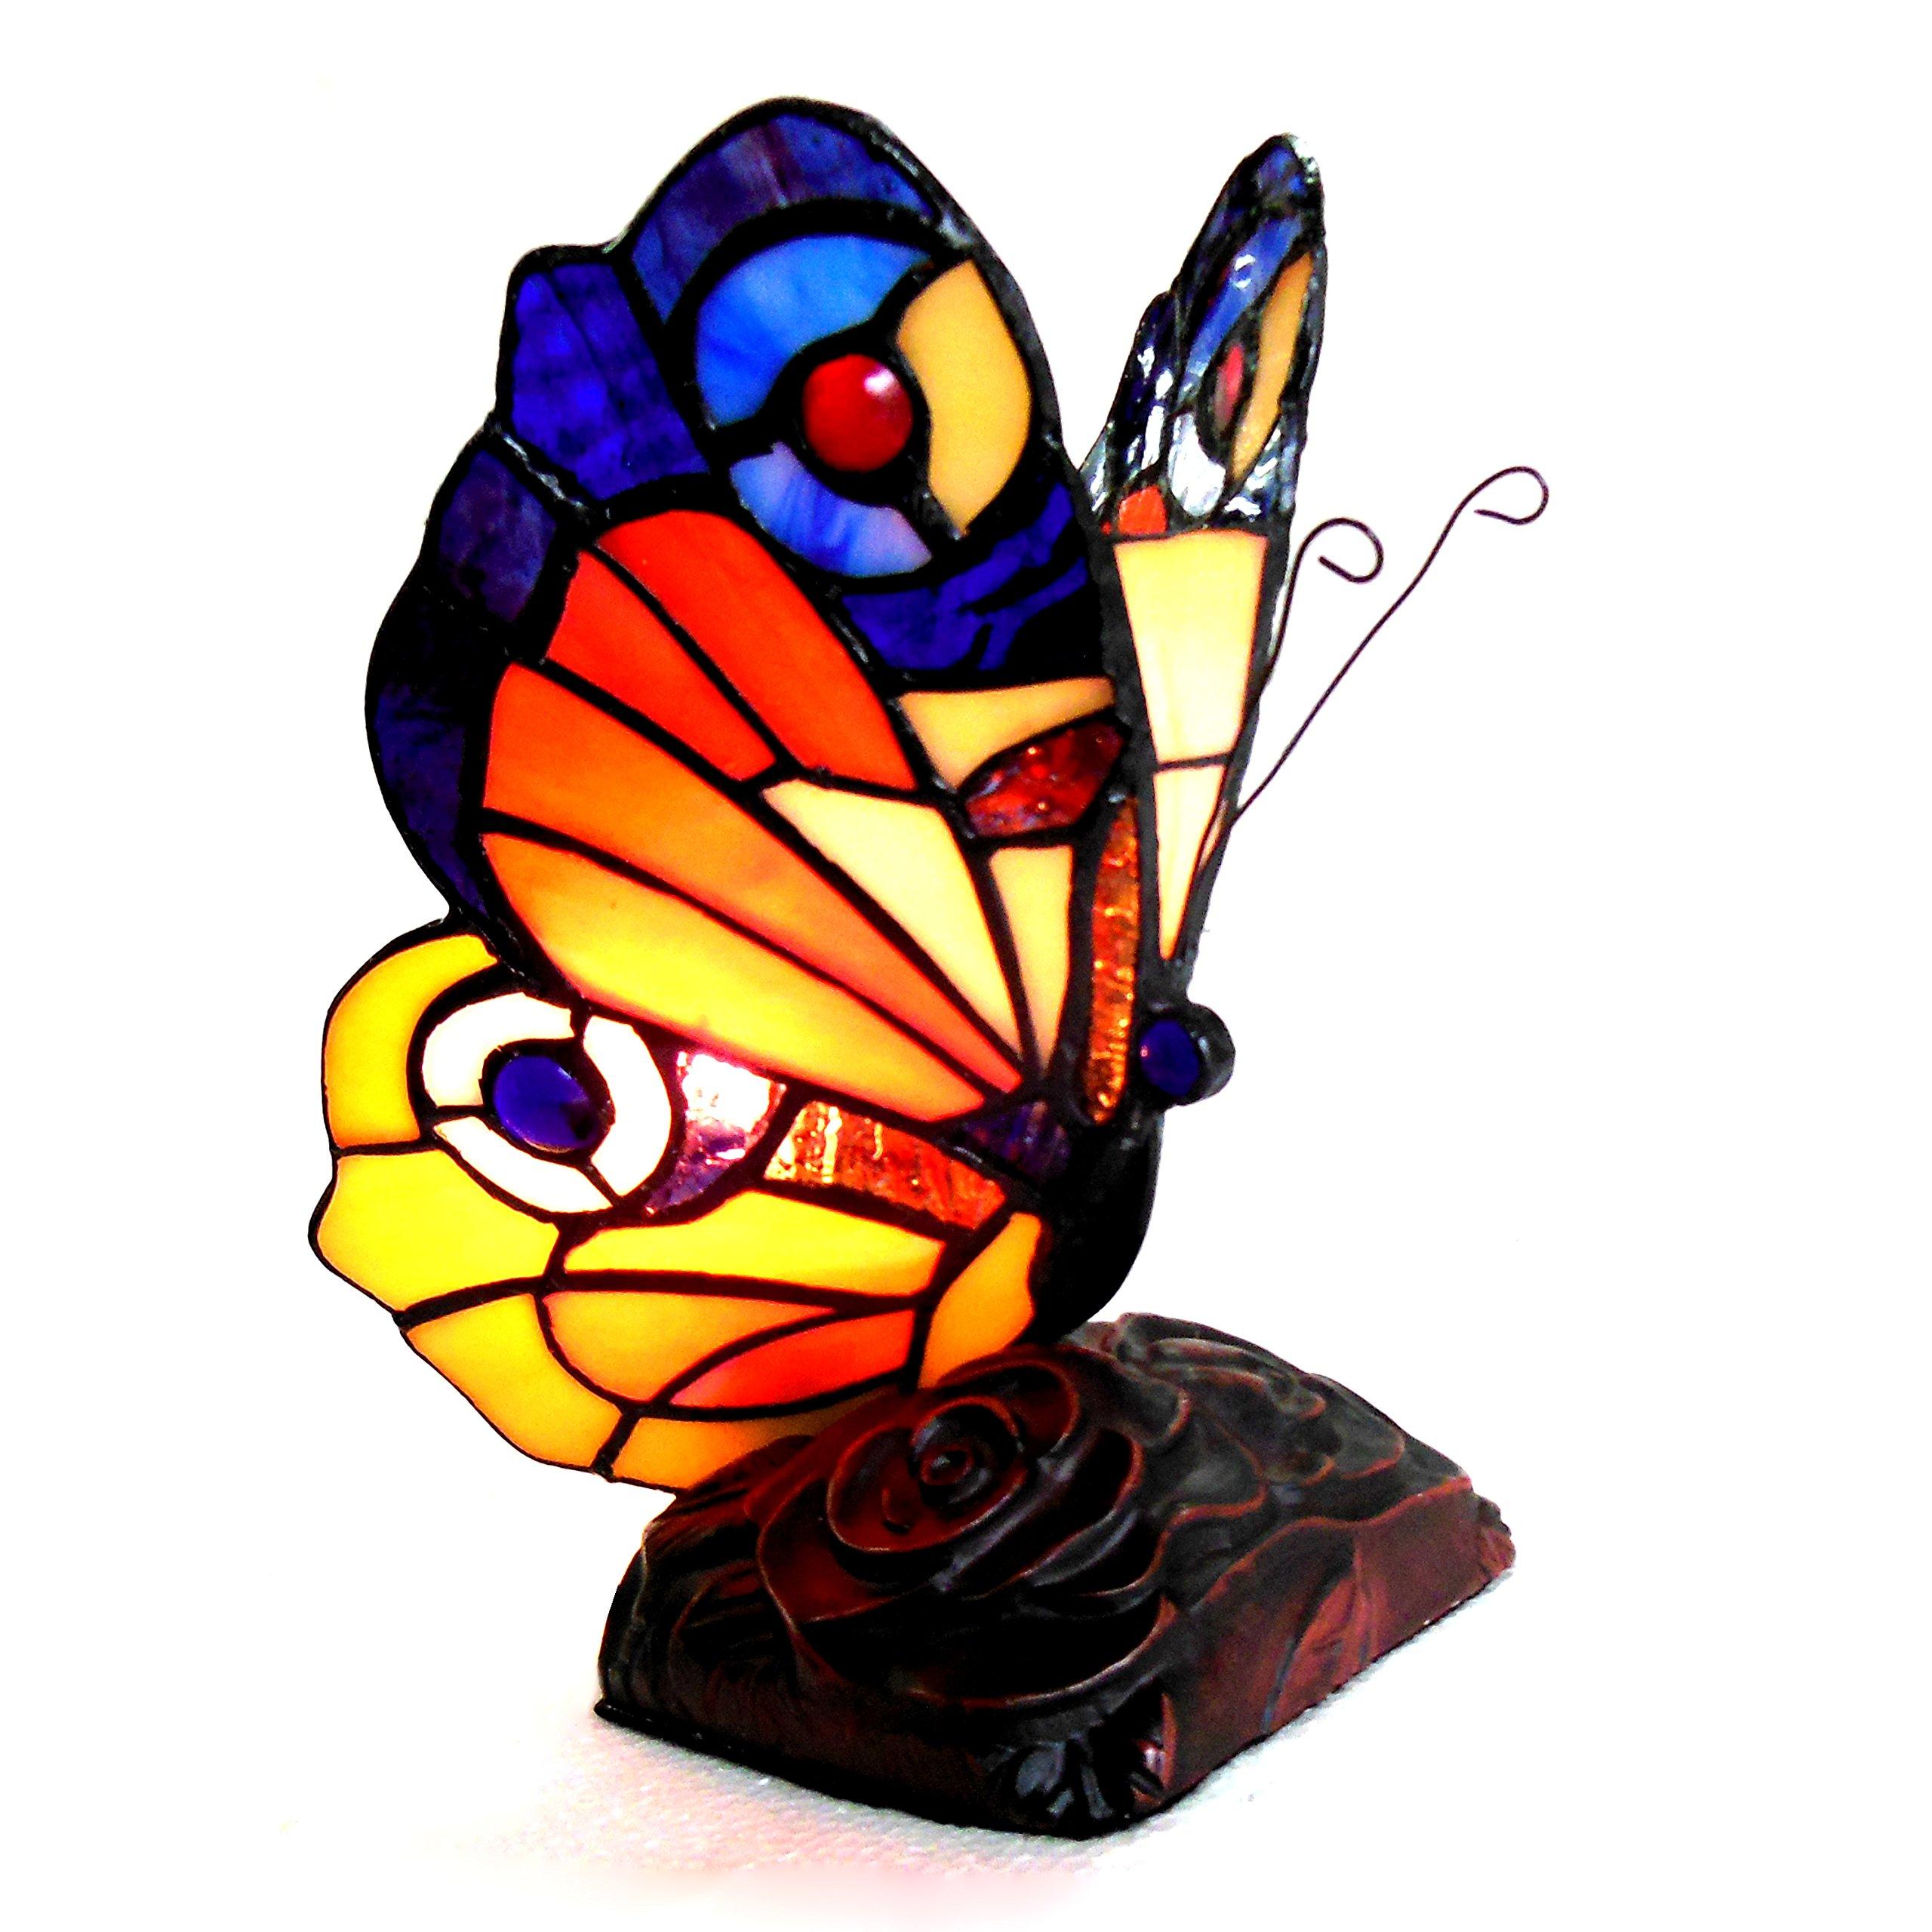 Chloe Lighting CH10809OA09-NL1 9'' Tall Kacy 6 Tiffany-Style 1 Butterfly Accent Table Lamp